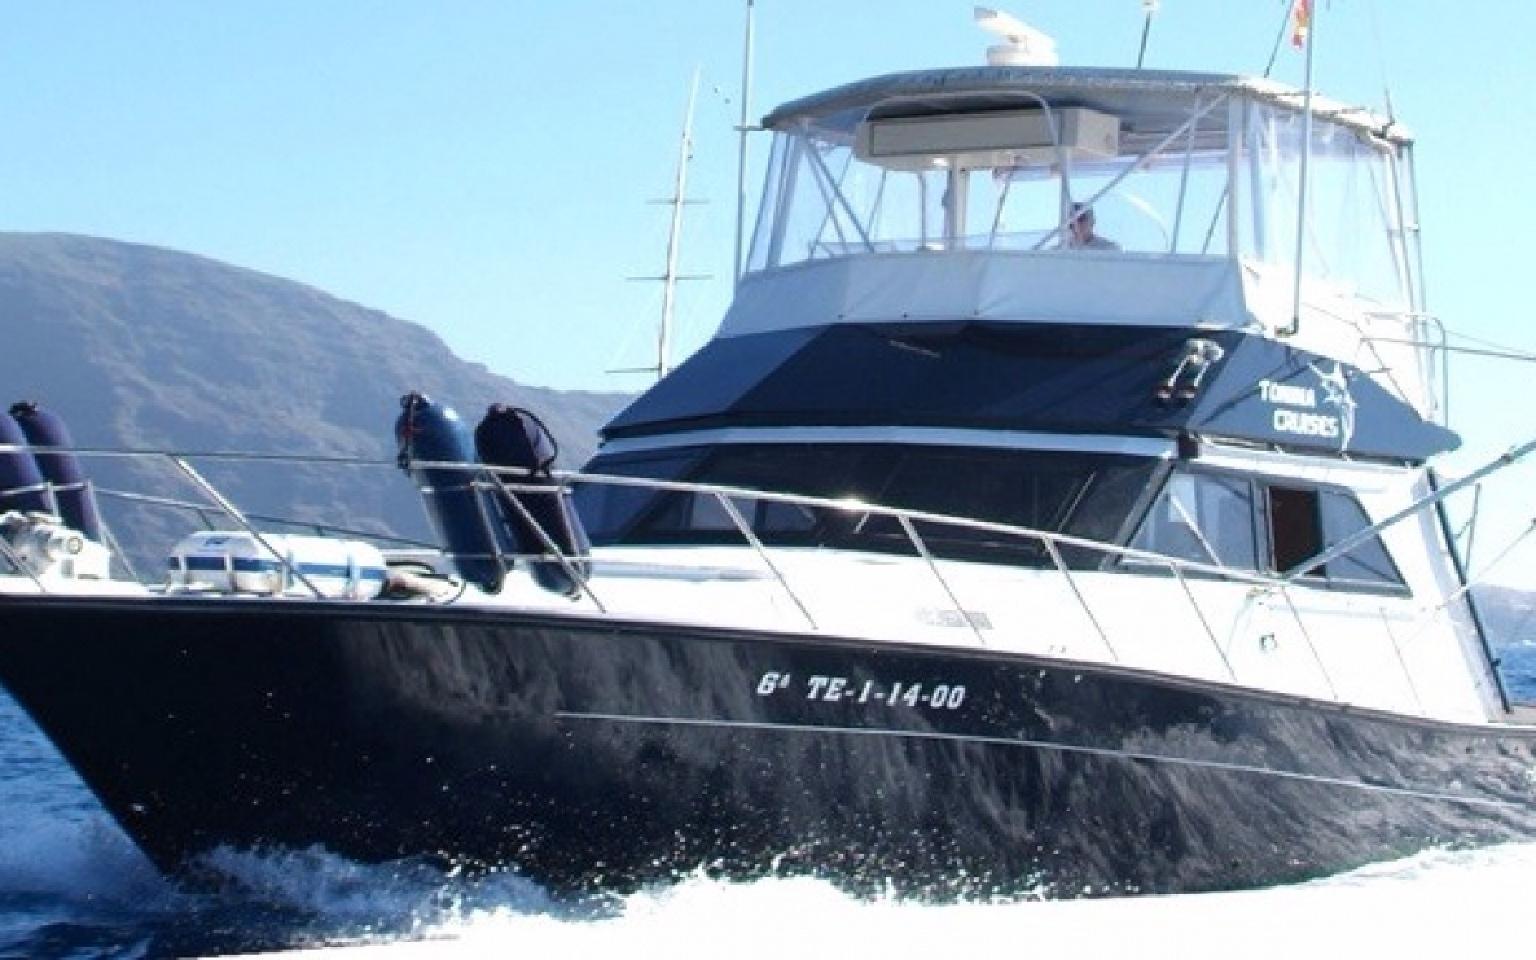 Cruz del sur boat 3h boat trip tenerife host boat for Fishing boat trips